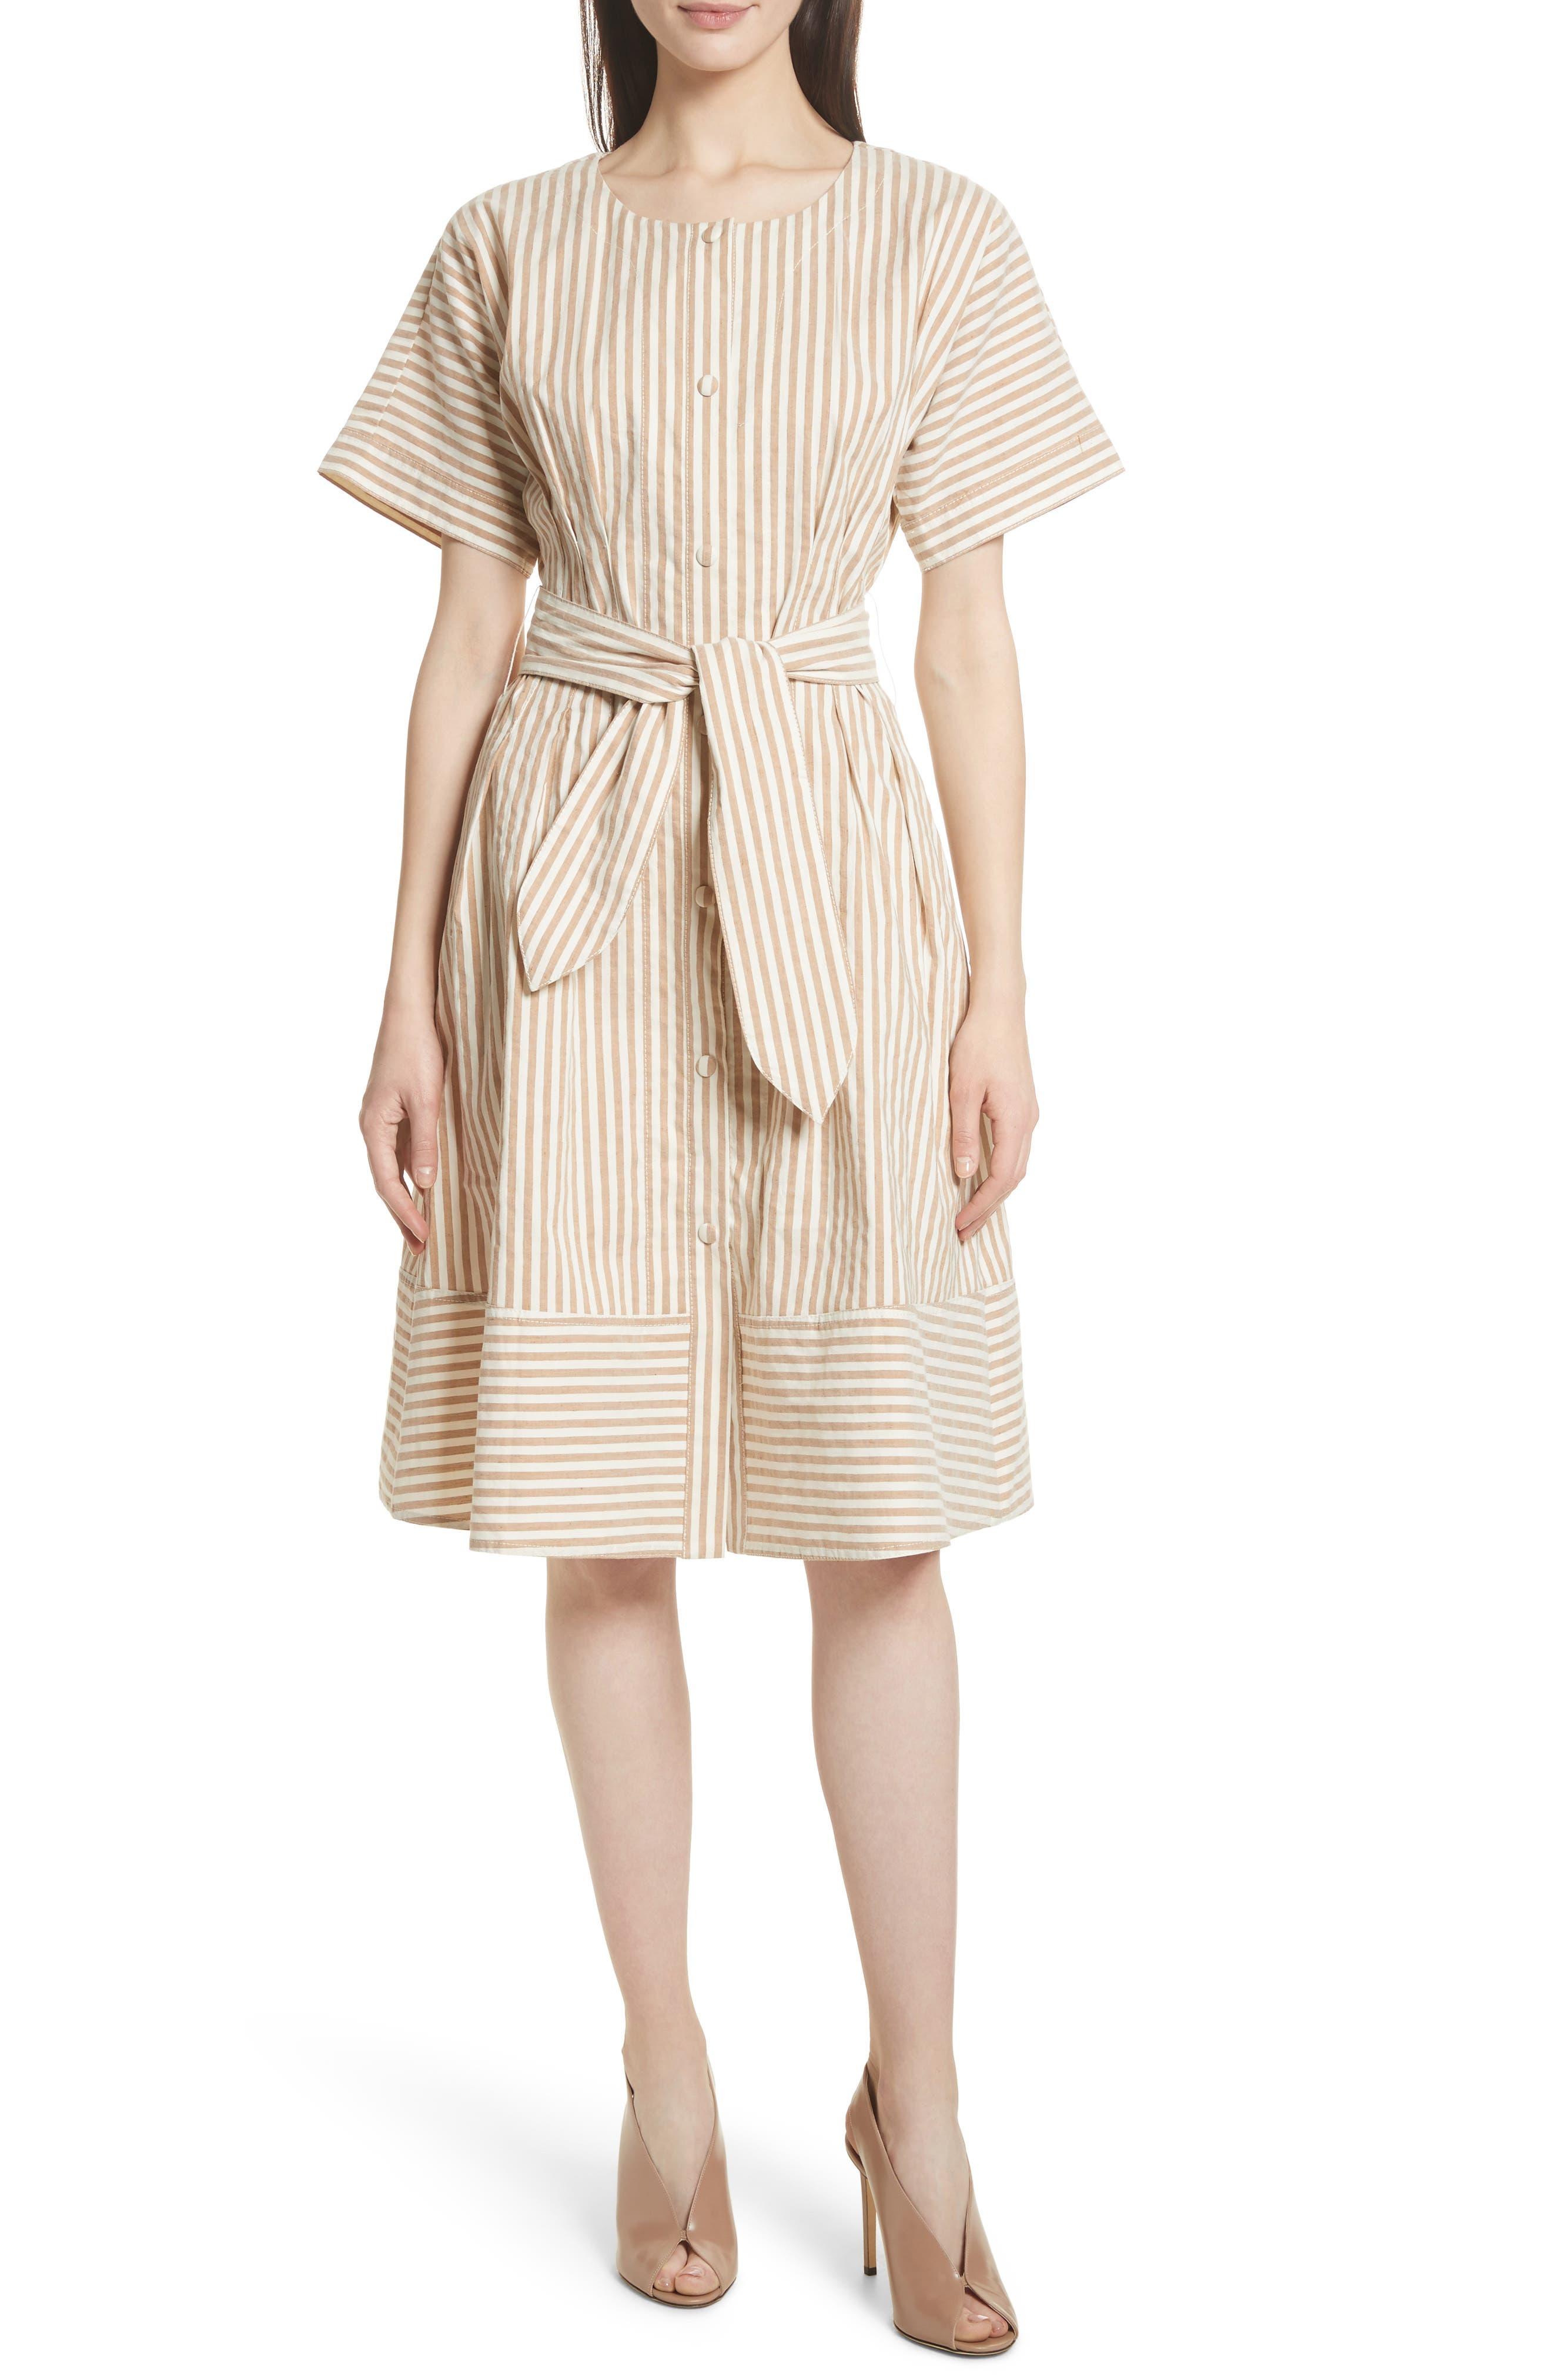 GREY Jason Wu Vintage Stripe Stretch Cotton & Linen Dress